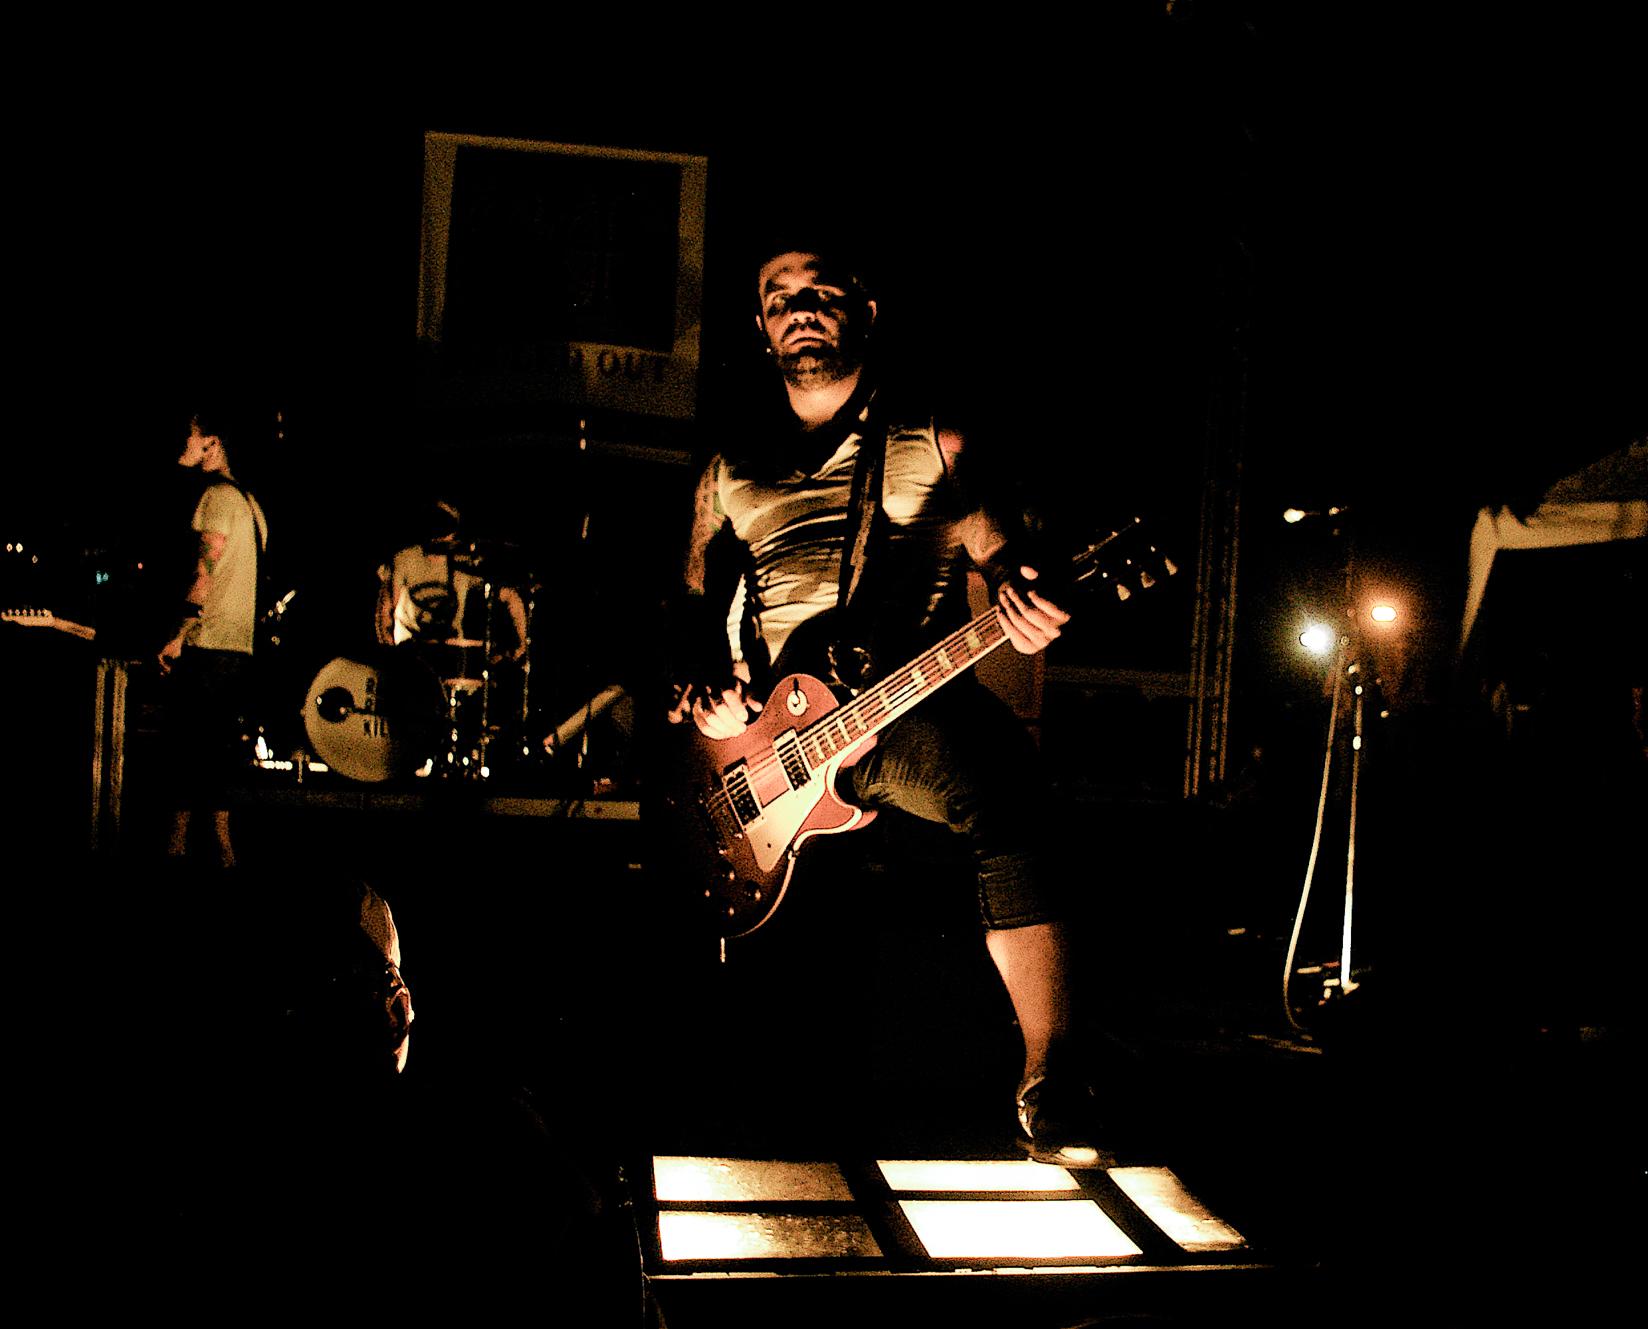 TheMatthewsmith-MusicPhotographer-4.jpg